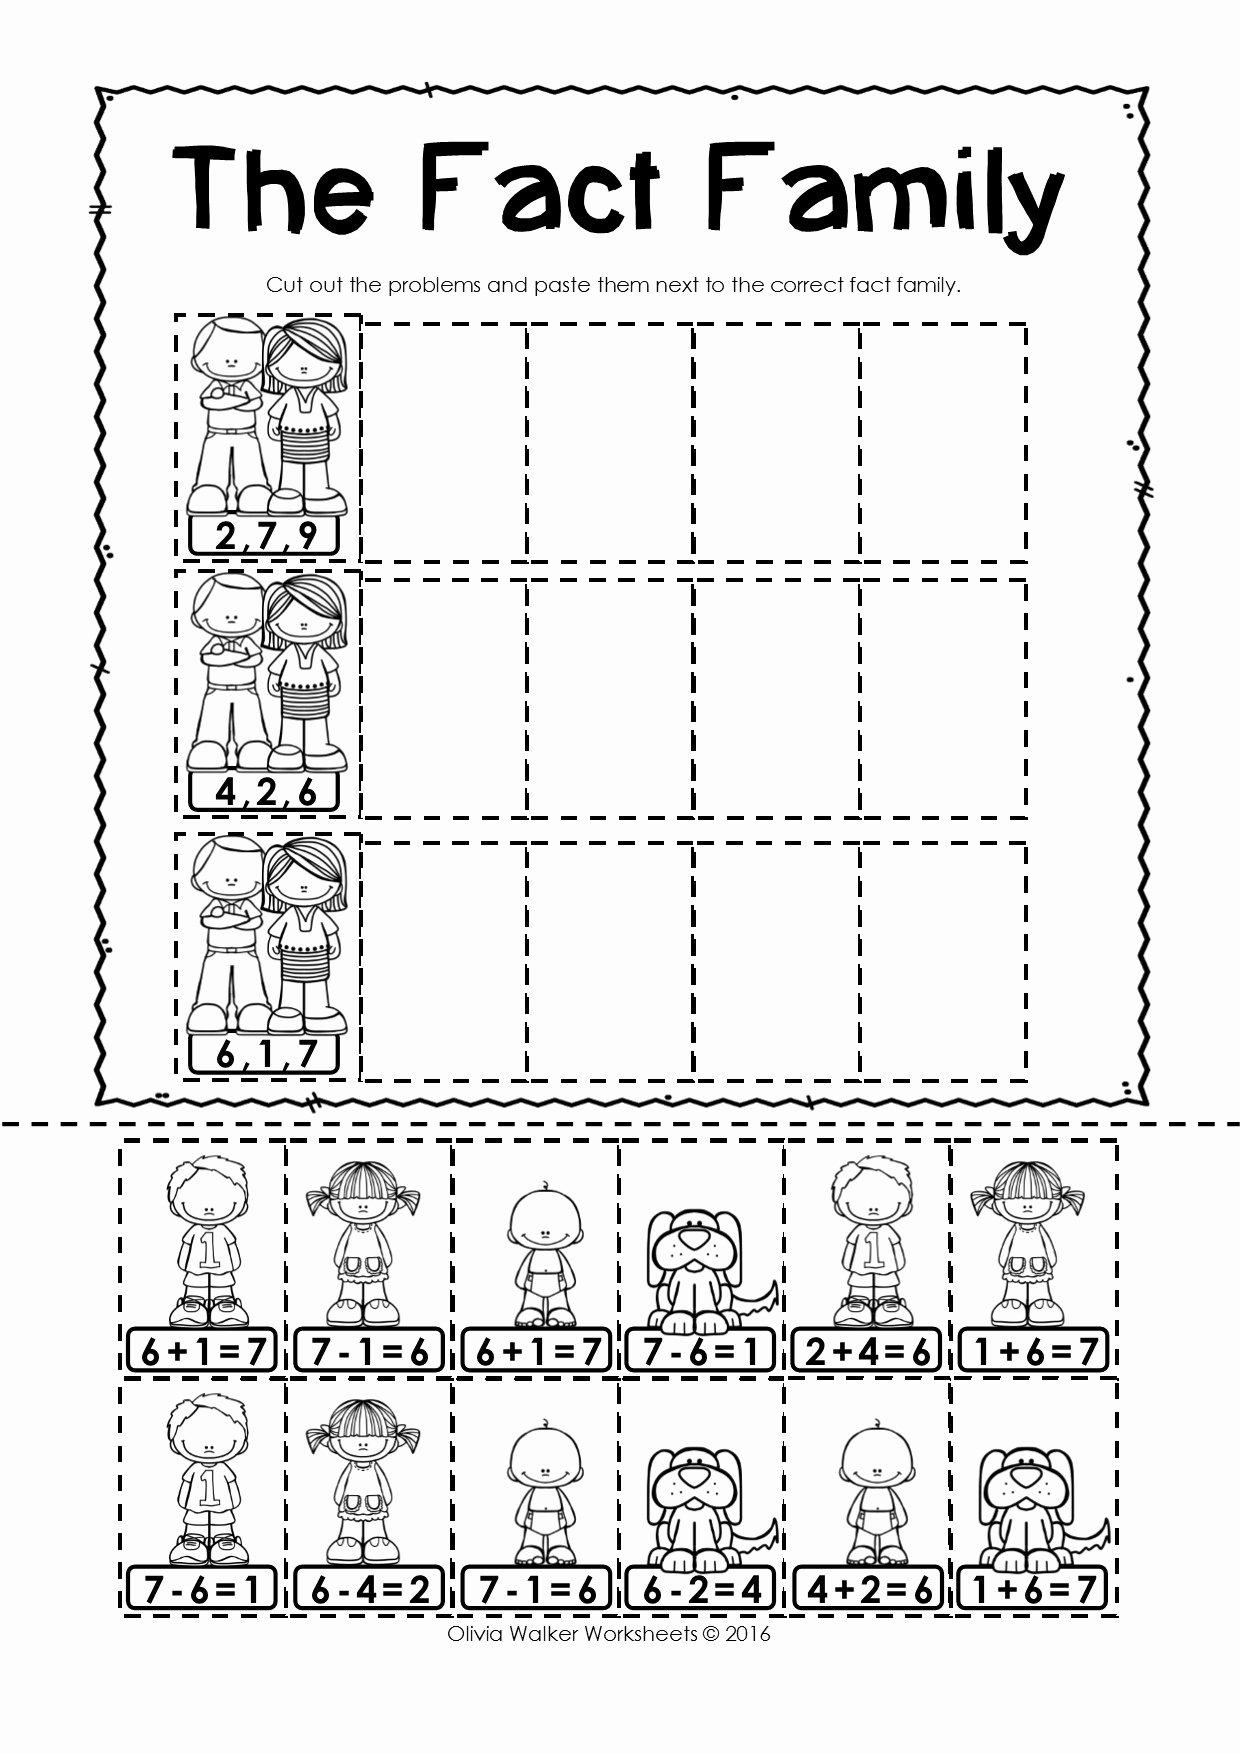 Speech Worksheets for Preschoolers New Worksheet Guest Speaker Speech for Preschool Graduation